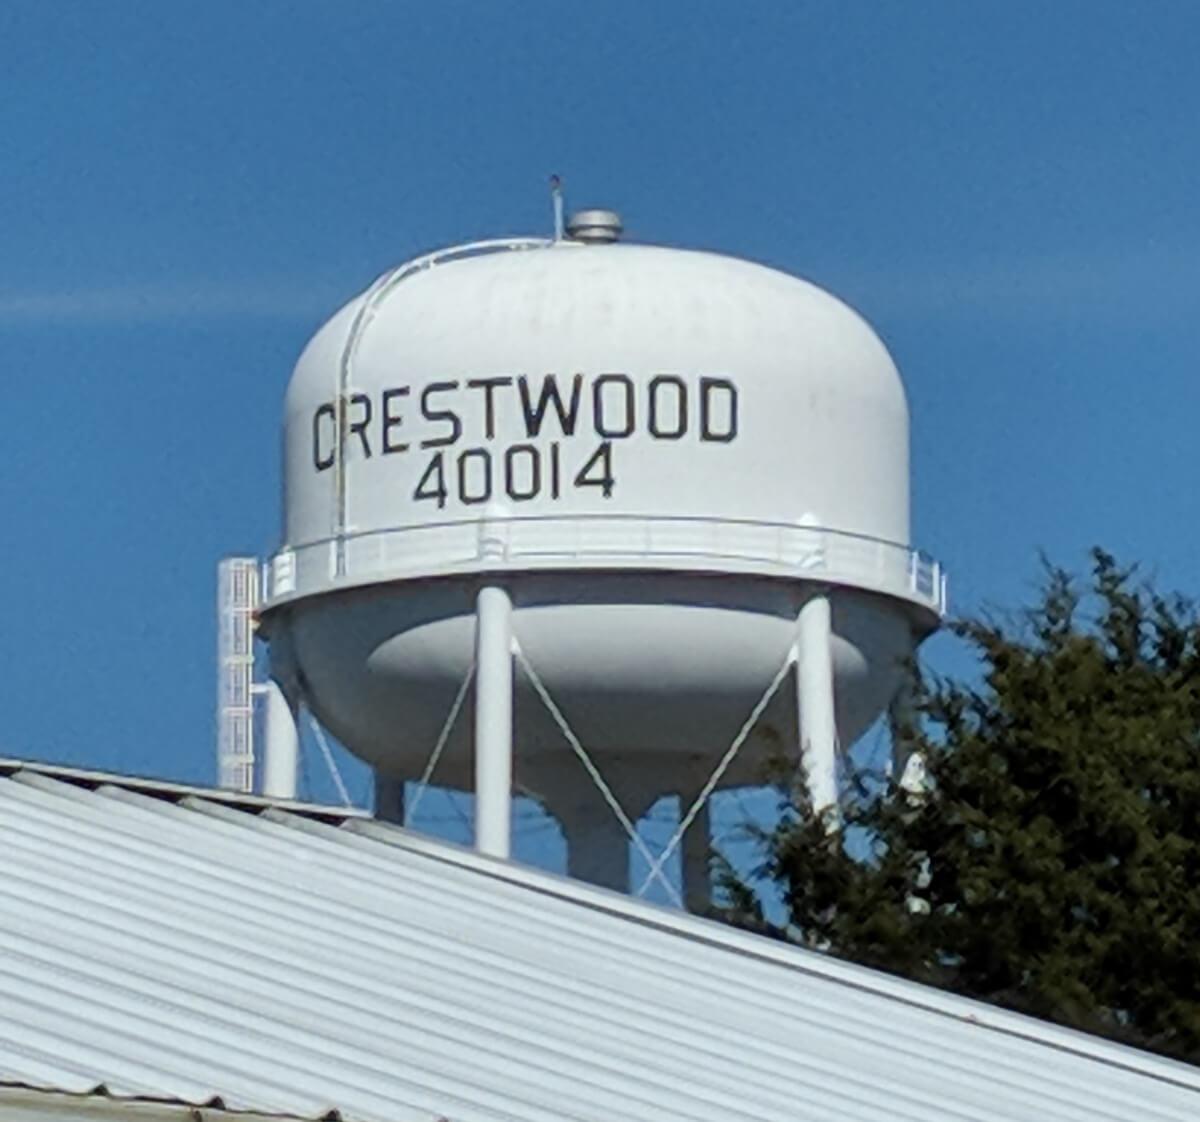 Crestwood Eye Doctor Crestwood 40014